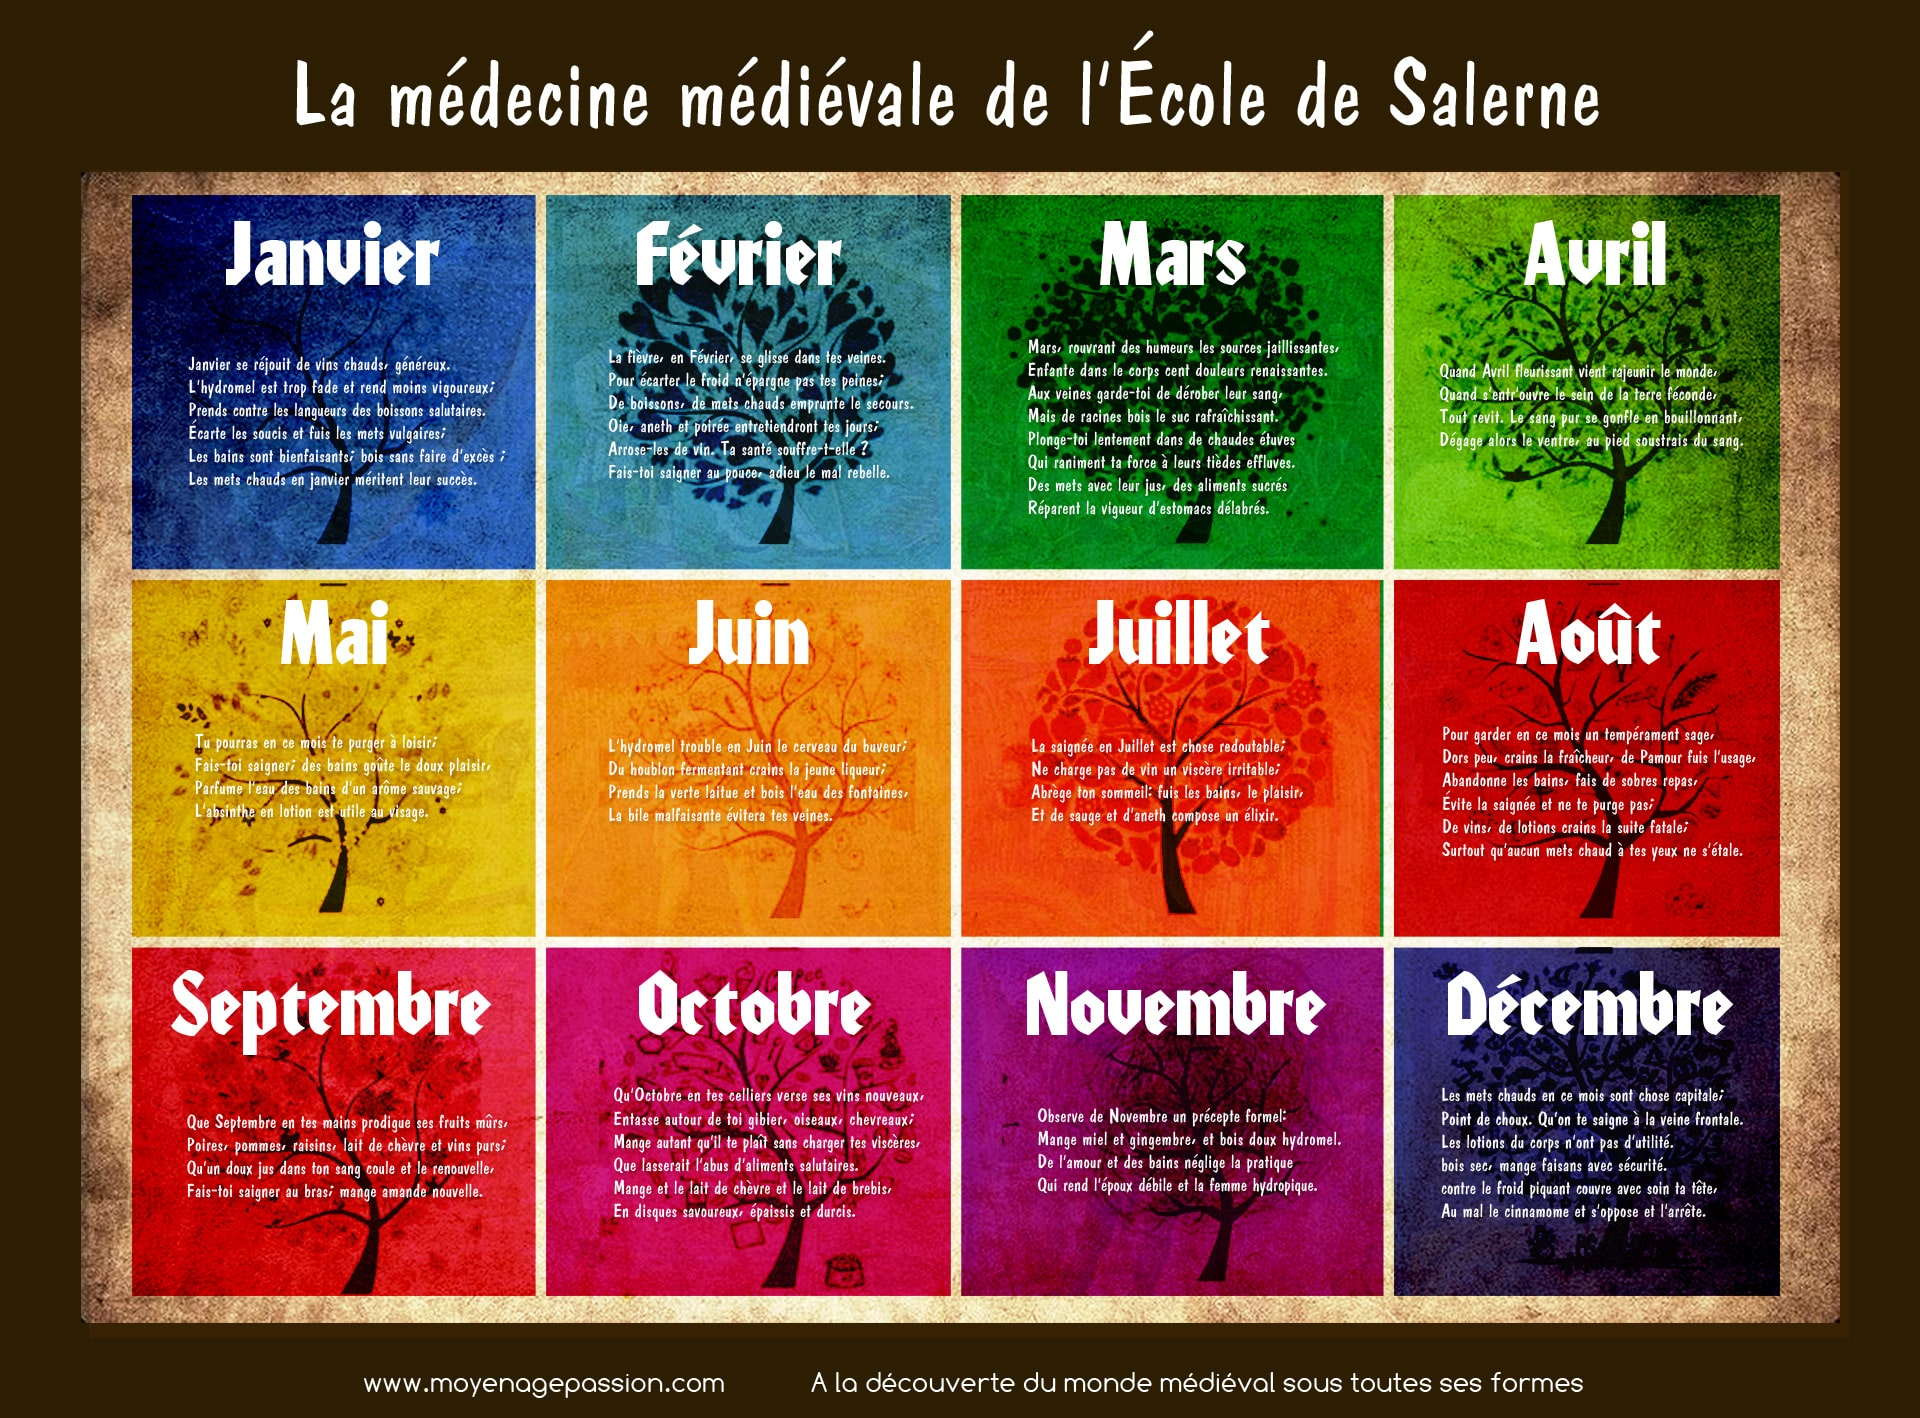 science_hygiene_medecine_medievale_salerne_mois_saignee_calendrier_moyen-age_central